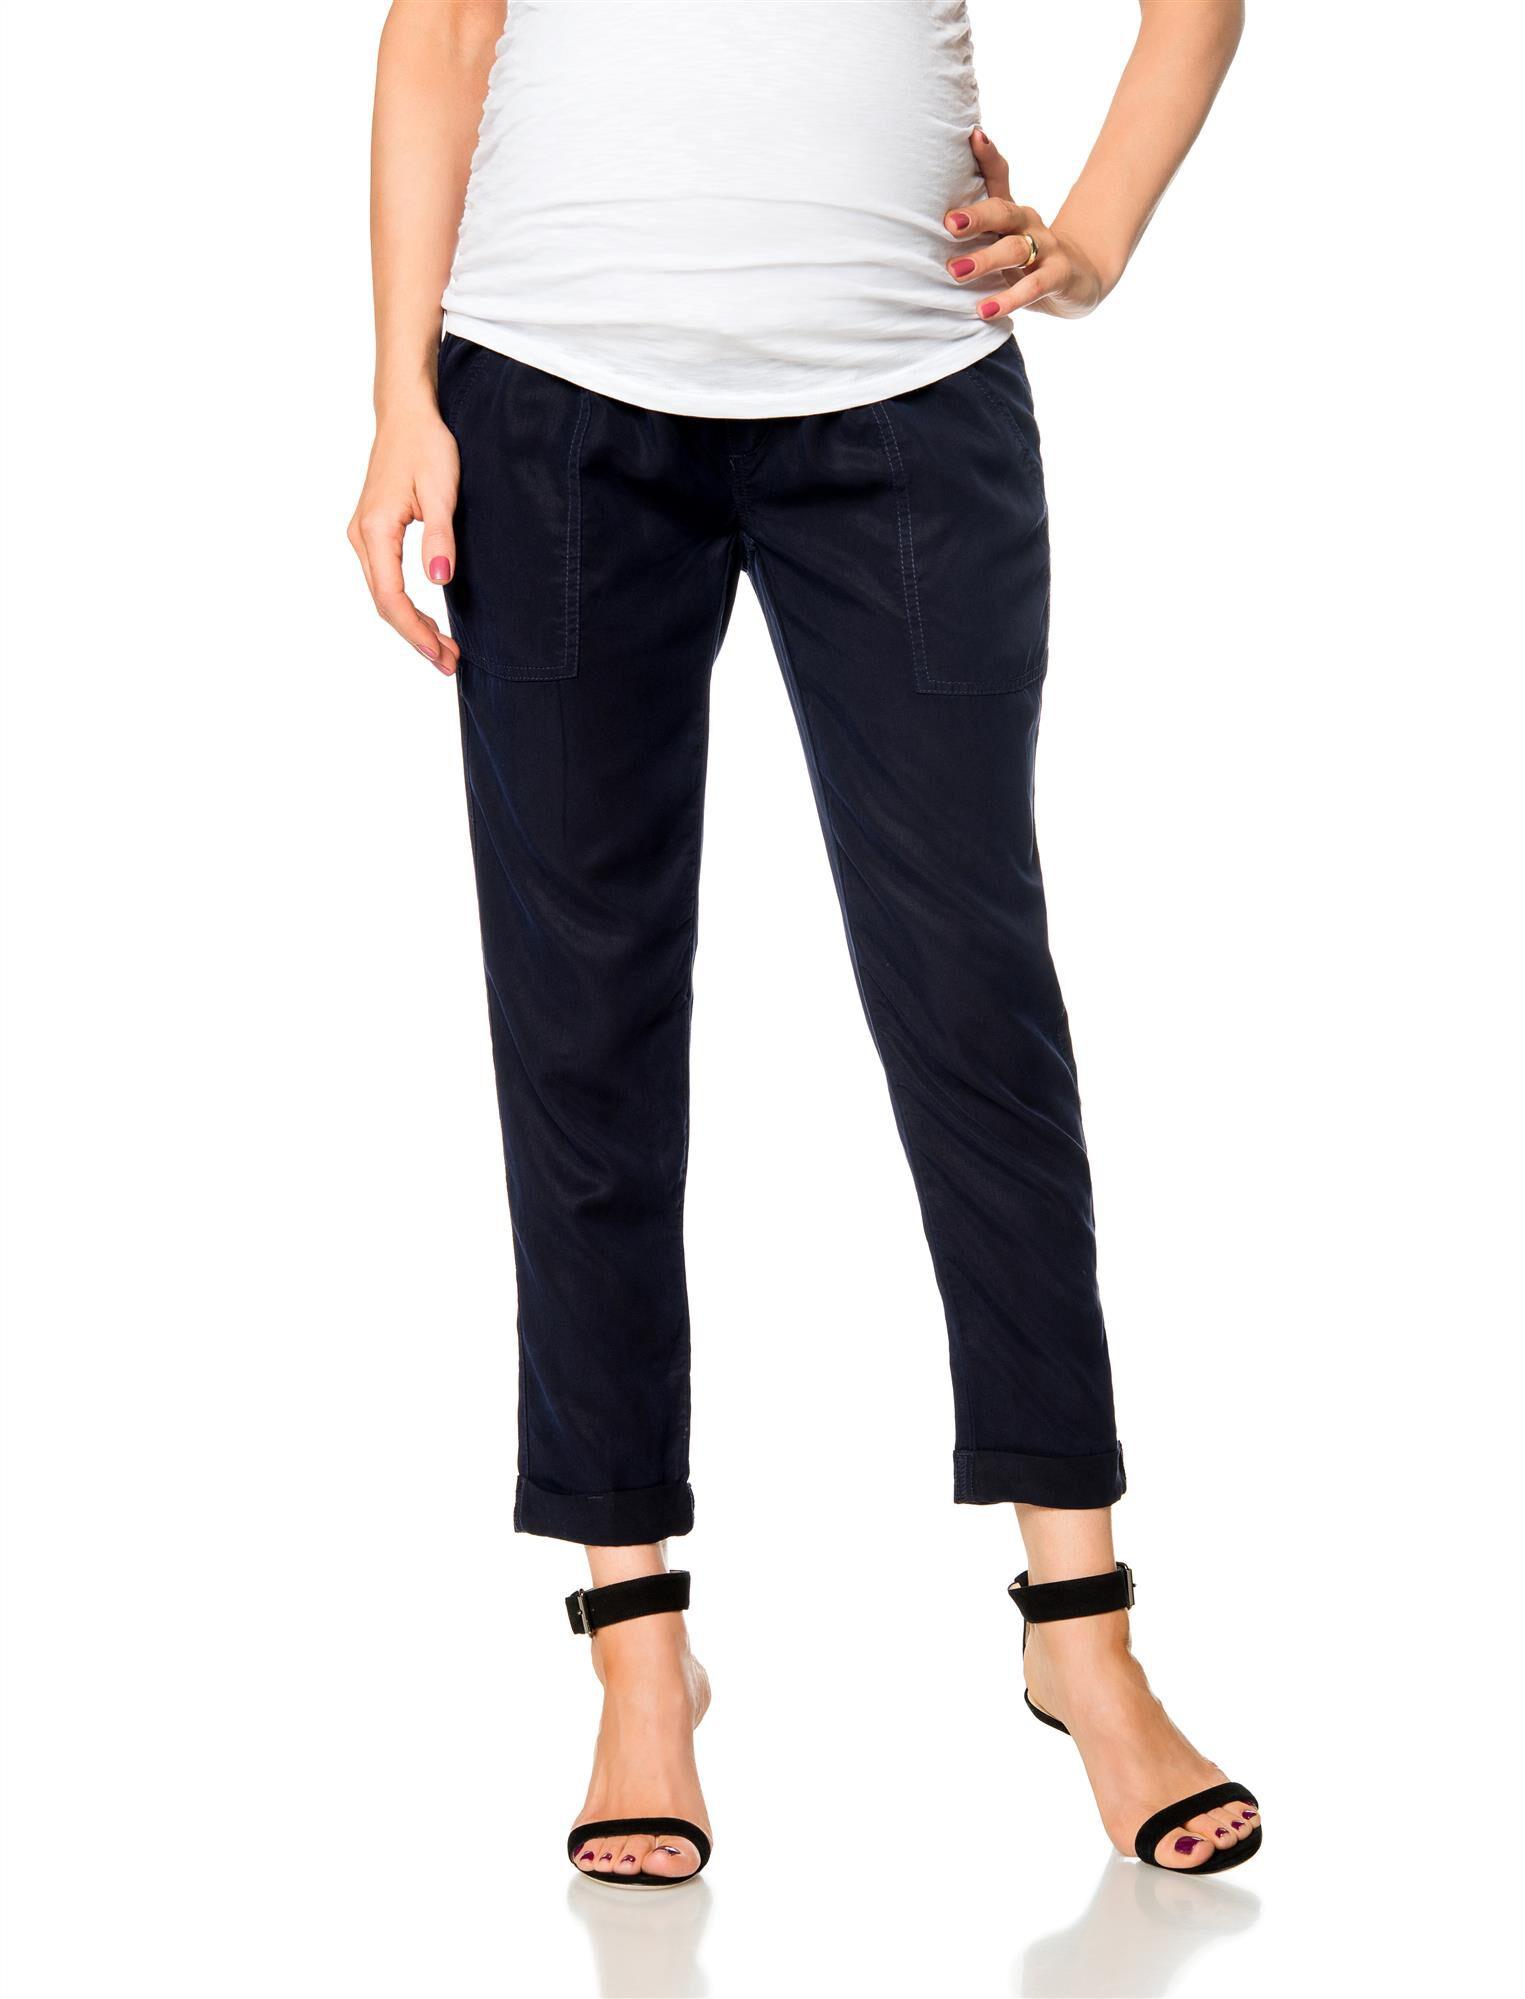 Pull On Style Cotton Woven Straight Leg Maternity Pants